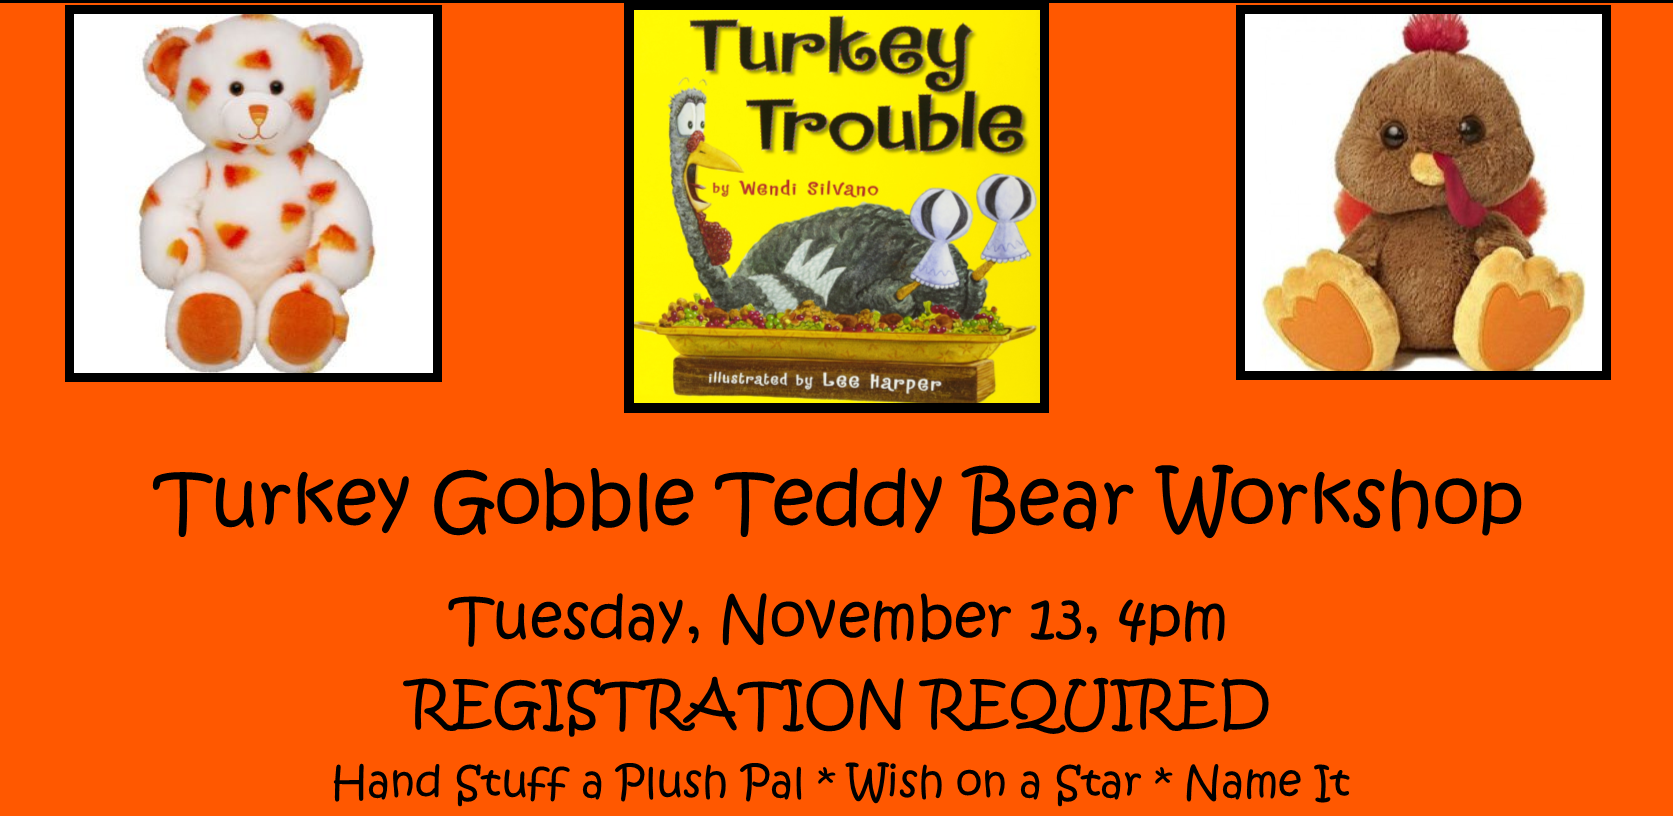 Turkey Gobble Teddy Bear Workshop